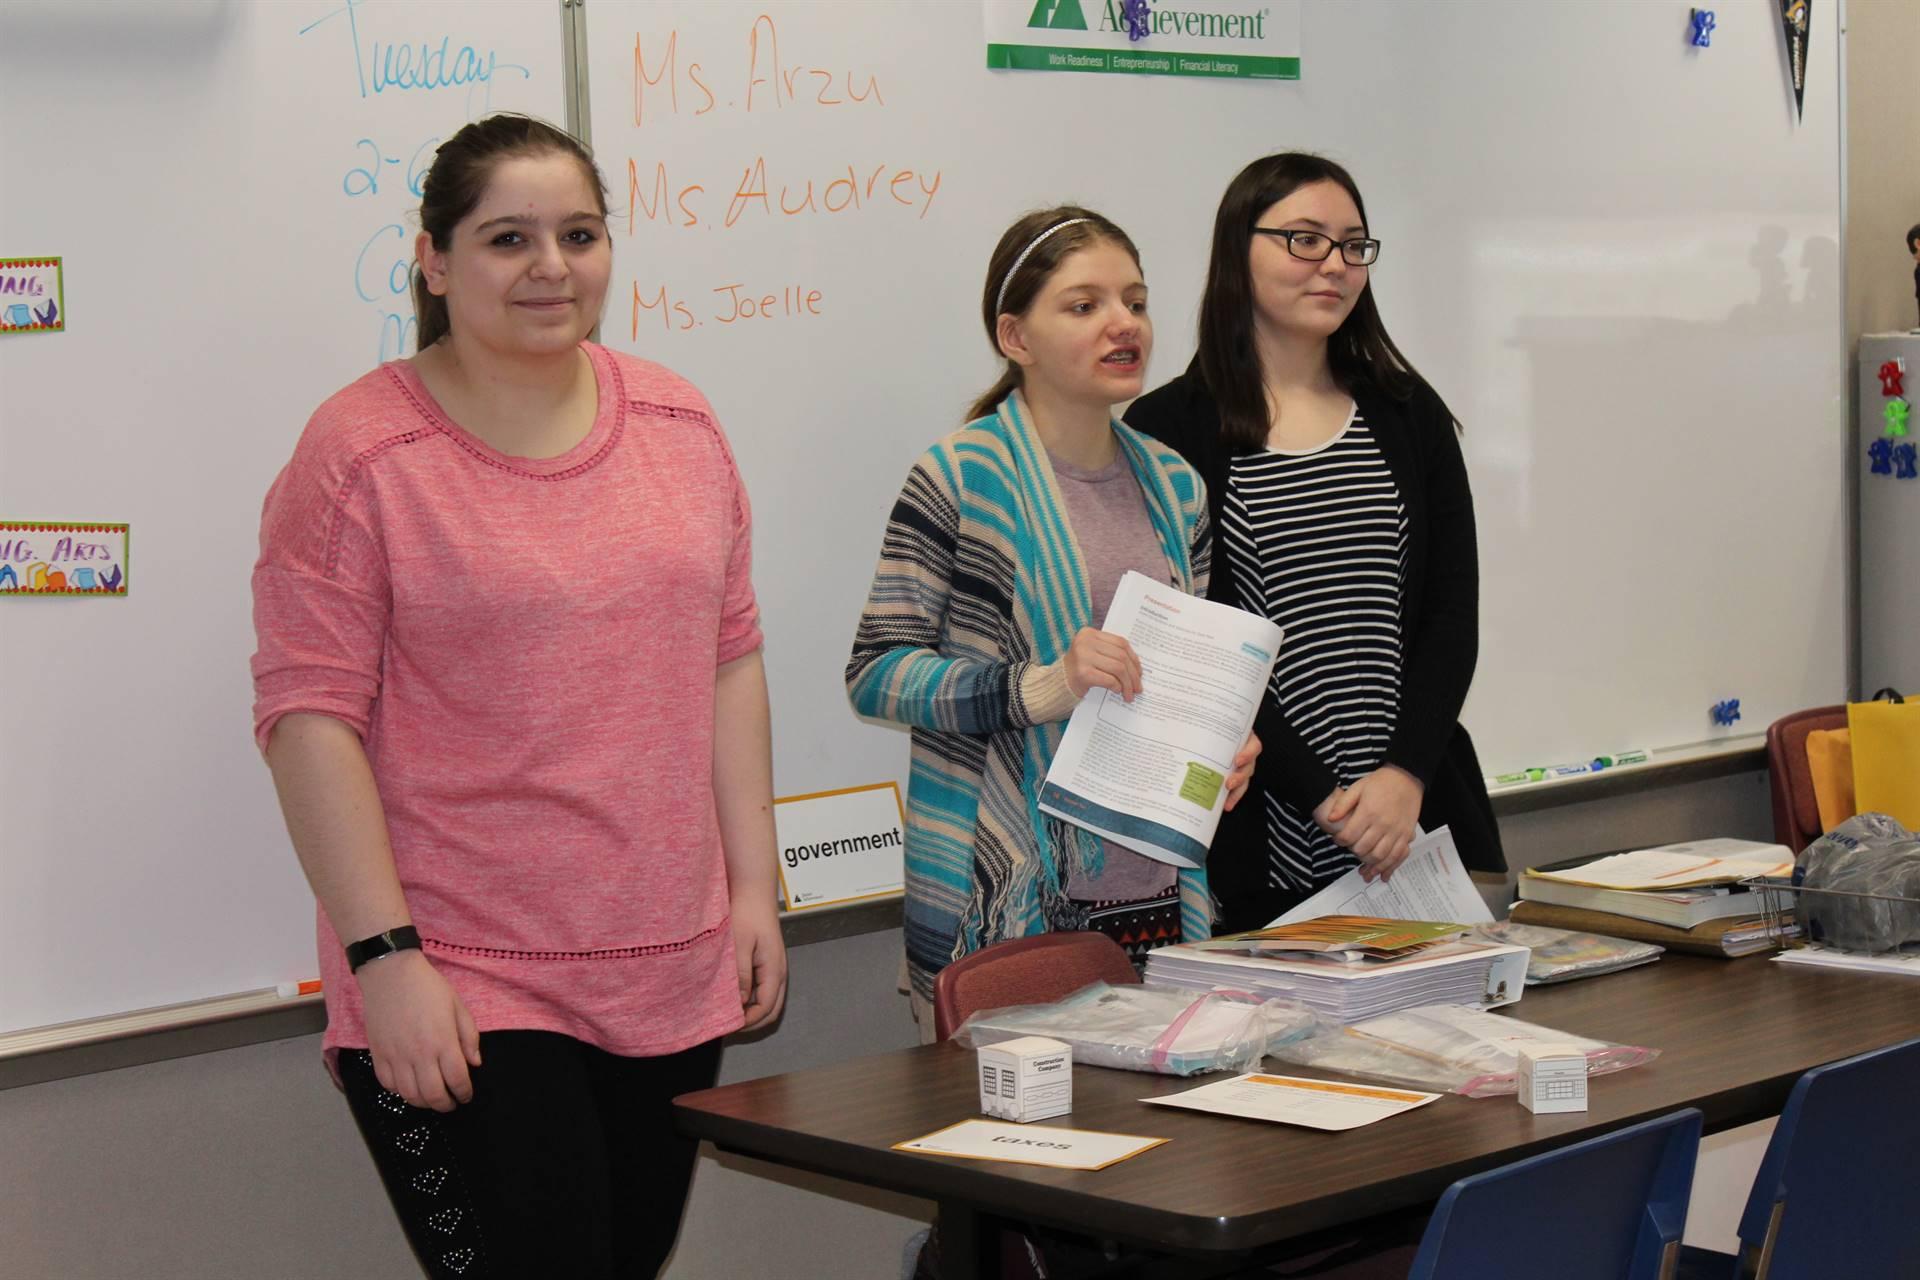 BPHS students teaching a lesson